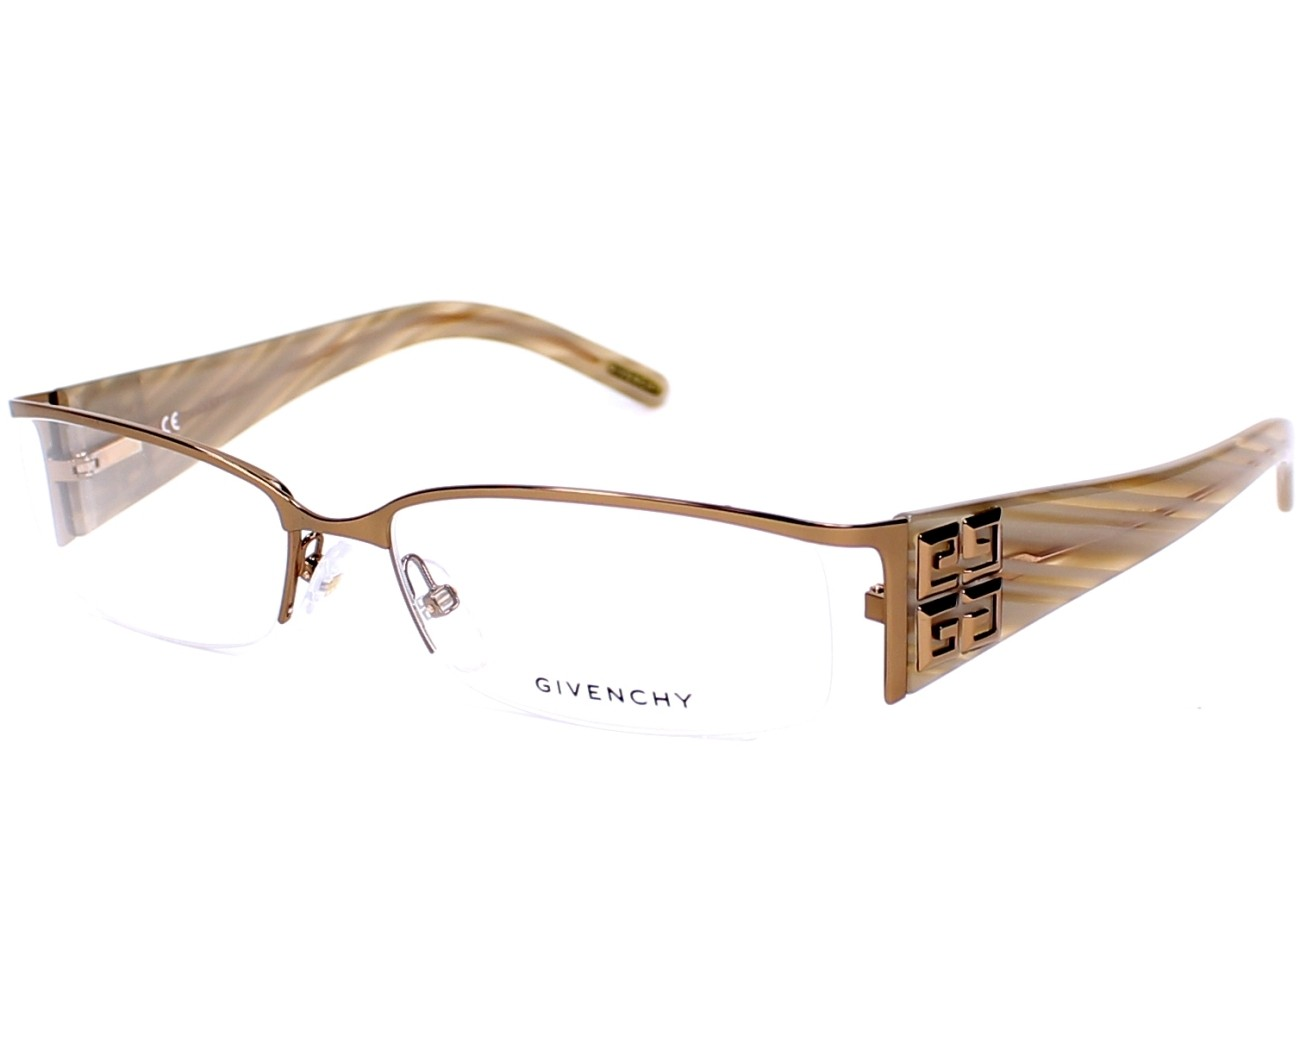 01823f1595e6 eyeglasses Givenchy VGV-302 0R80 - Gold Copper Beige profile view